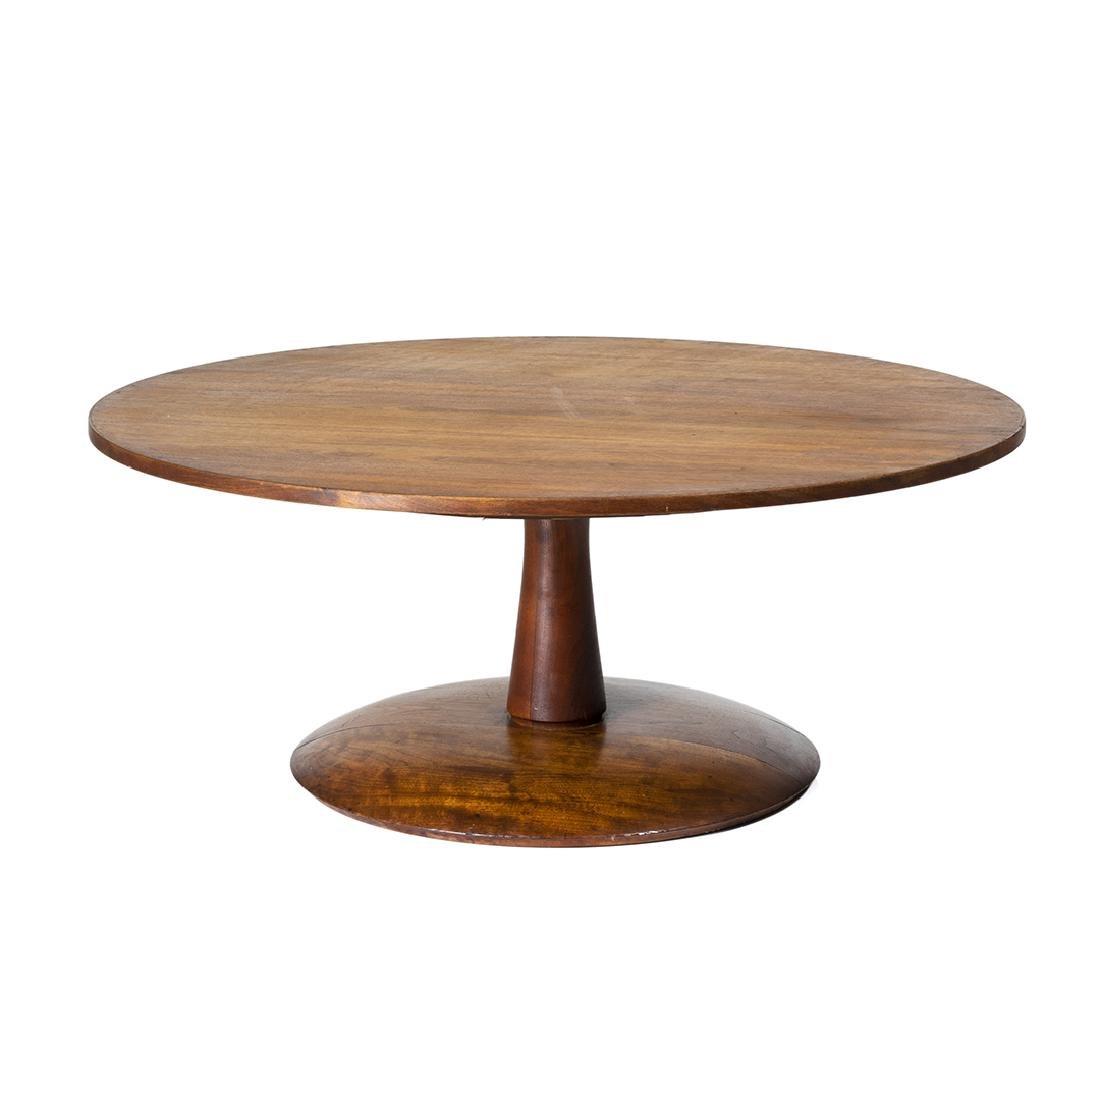 Modernist Coffee Table